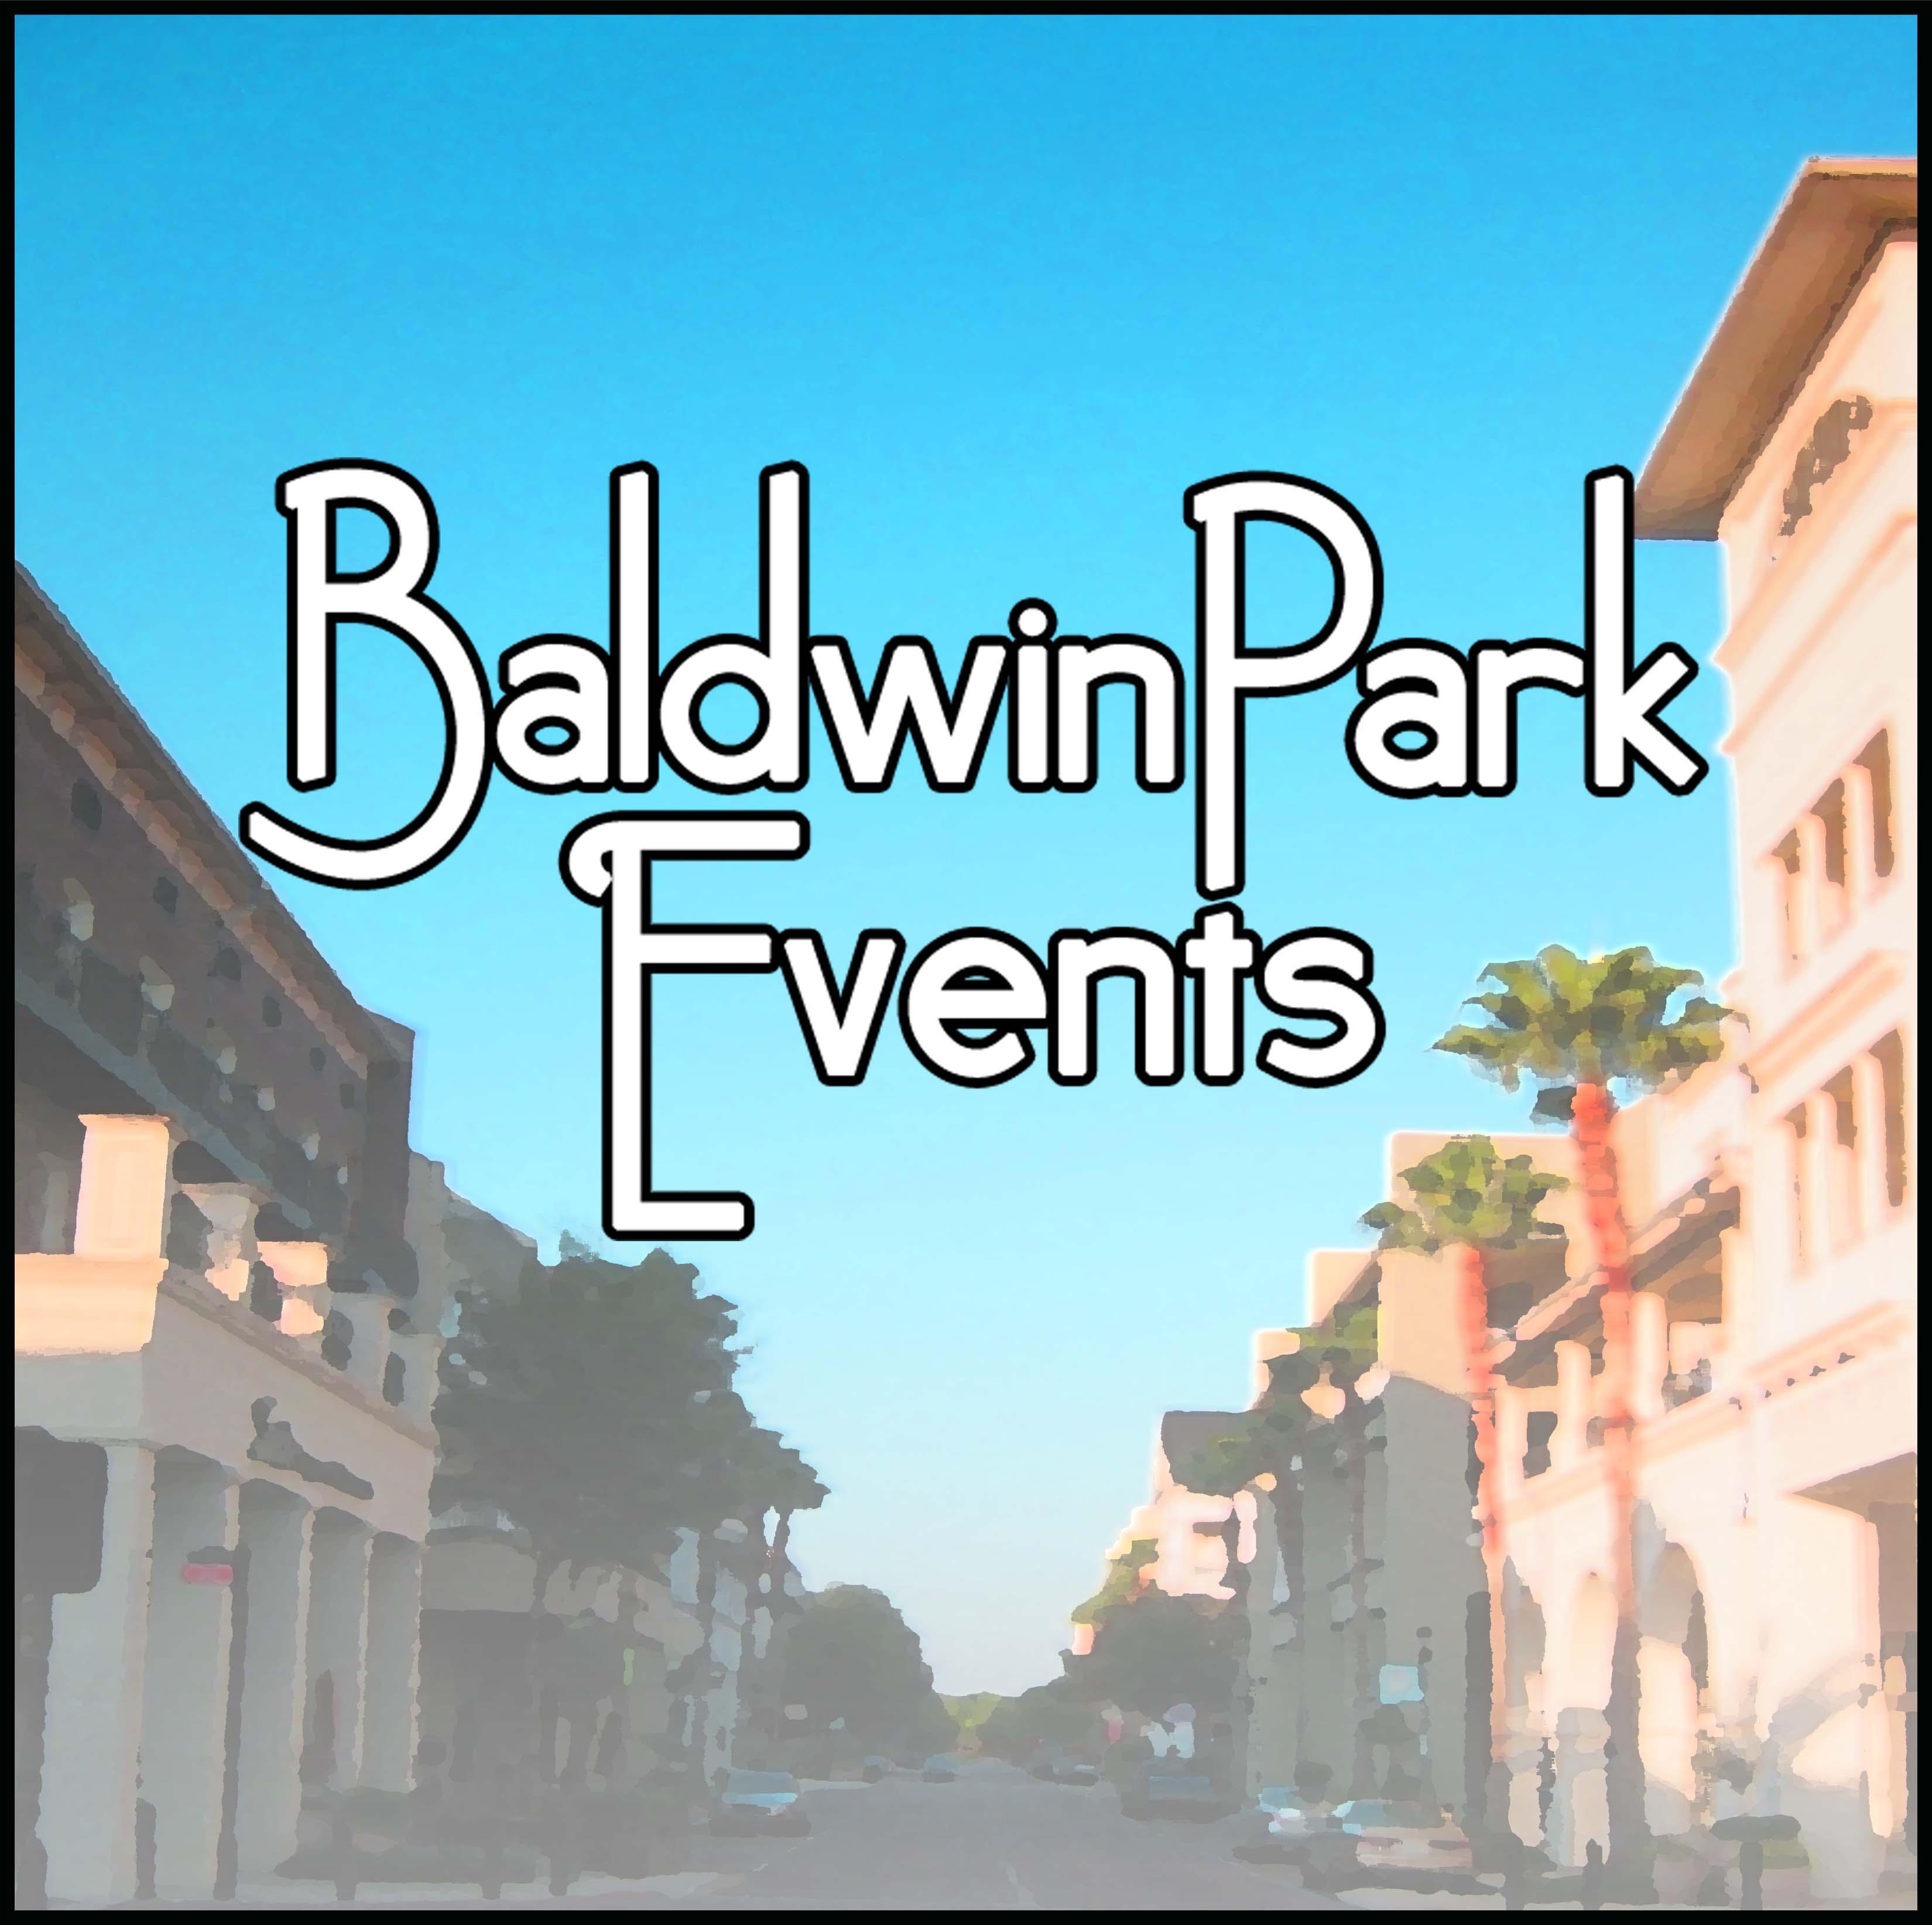 Baldwin Park Baldwin Park: Baldwin-park-events